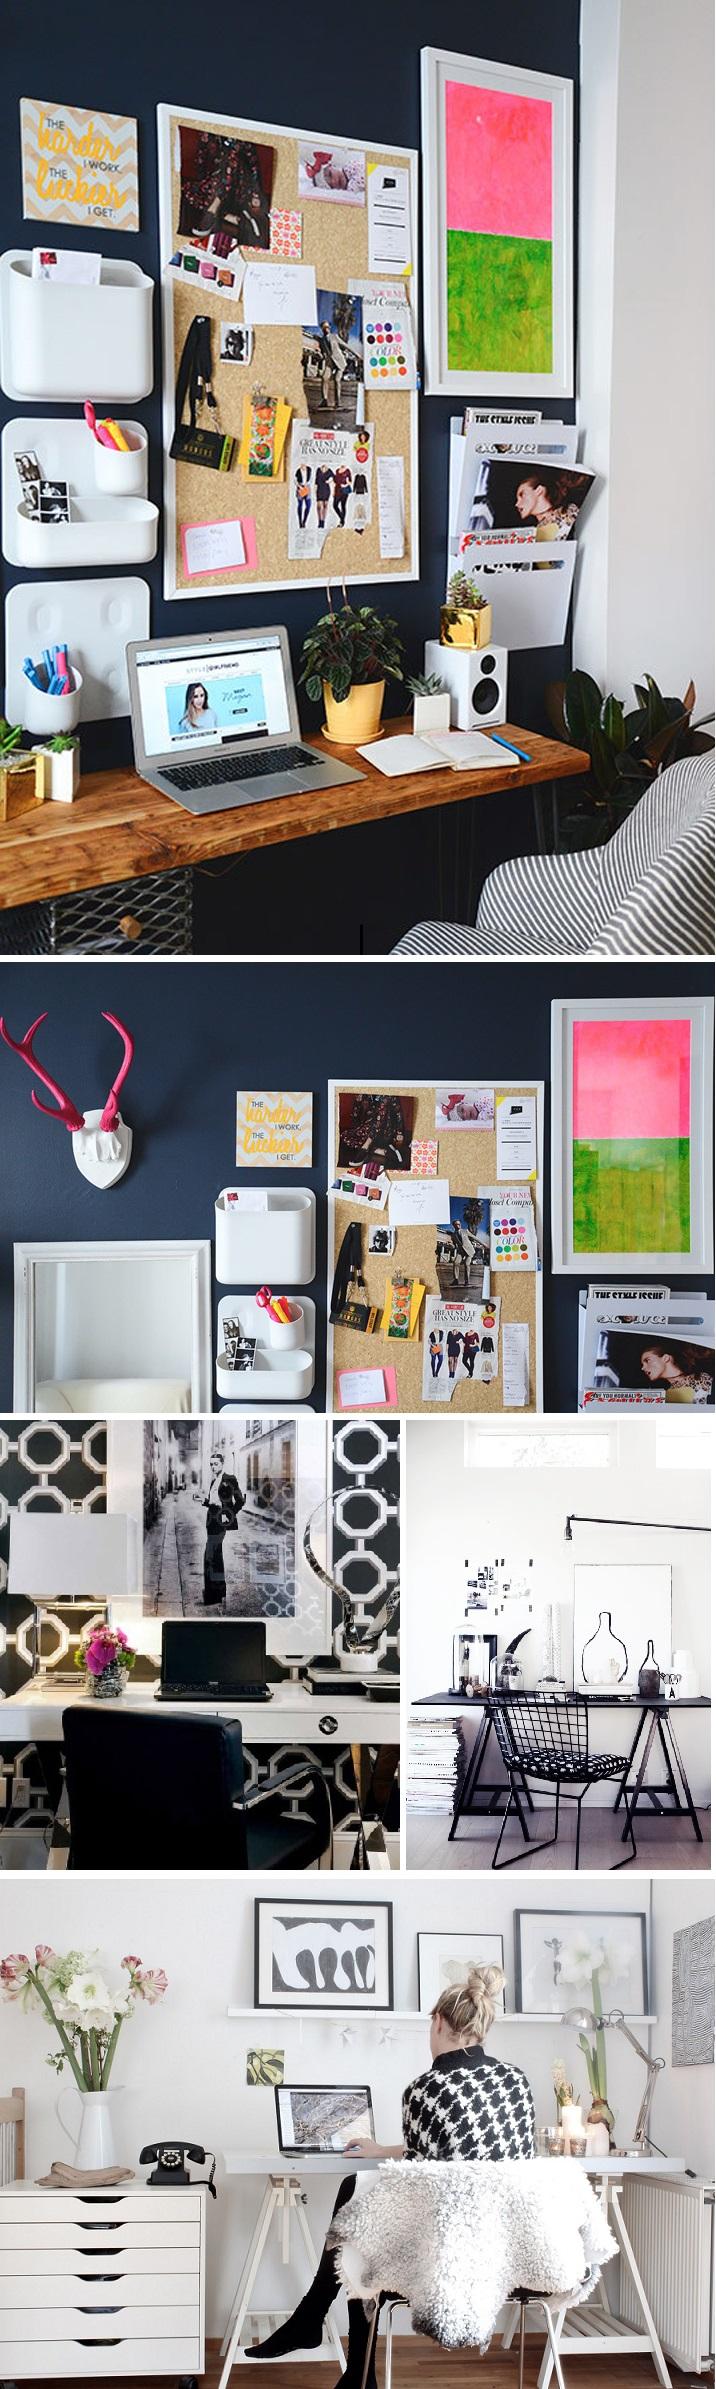 Home office dos sonhos3